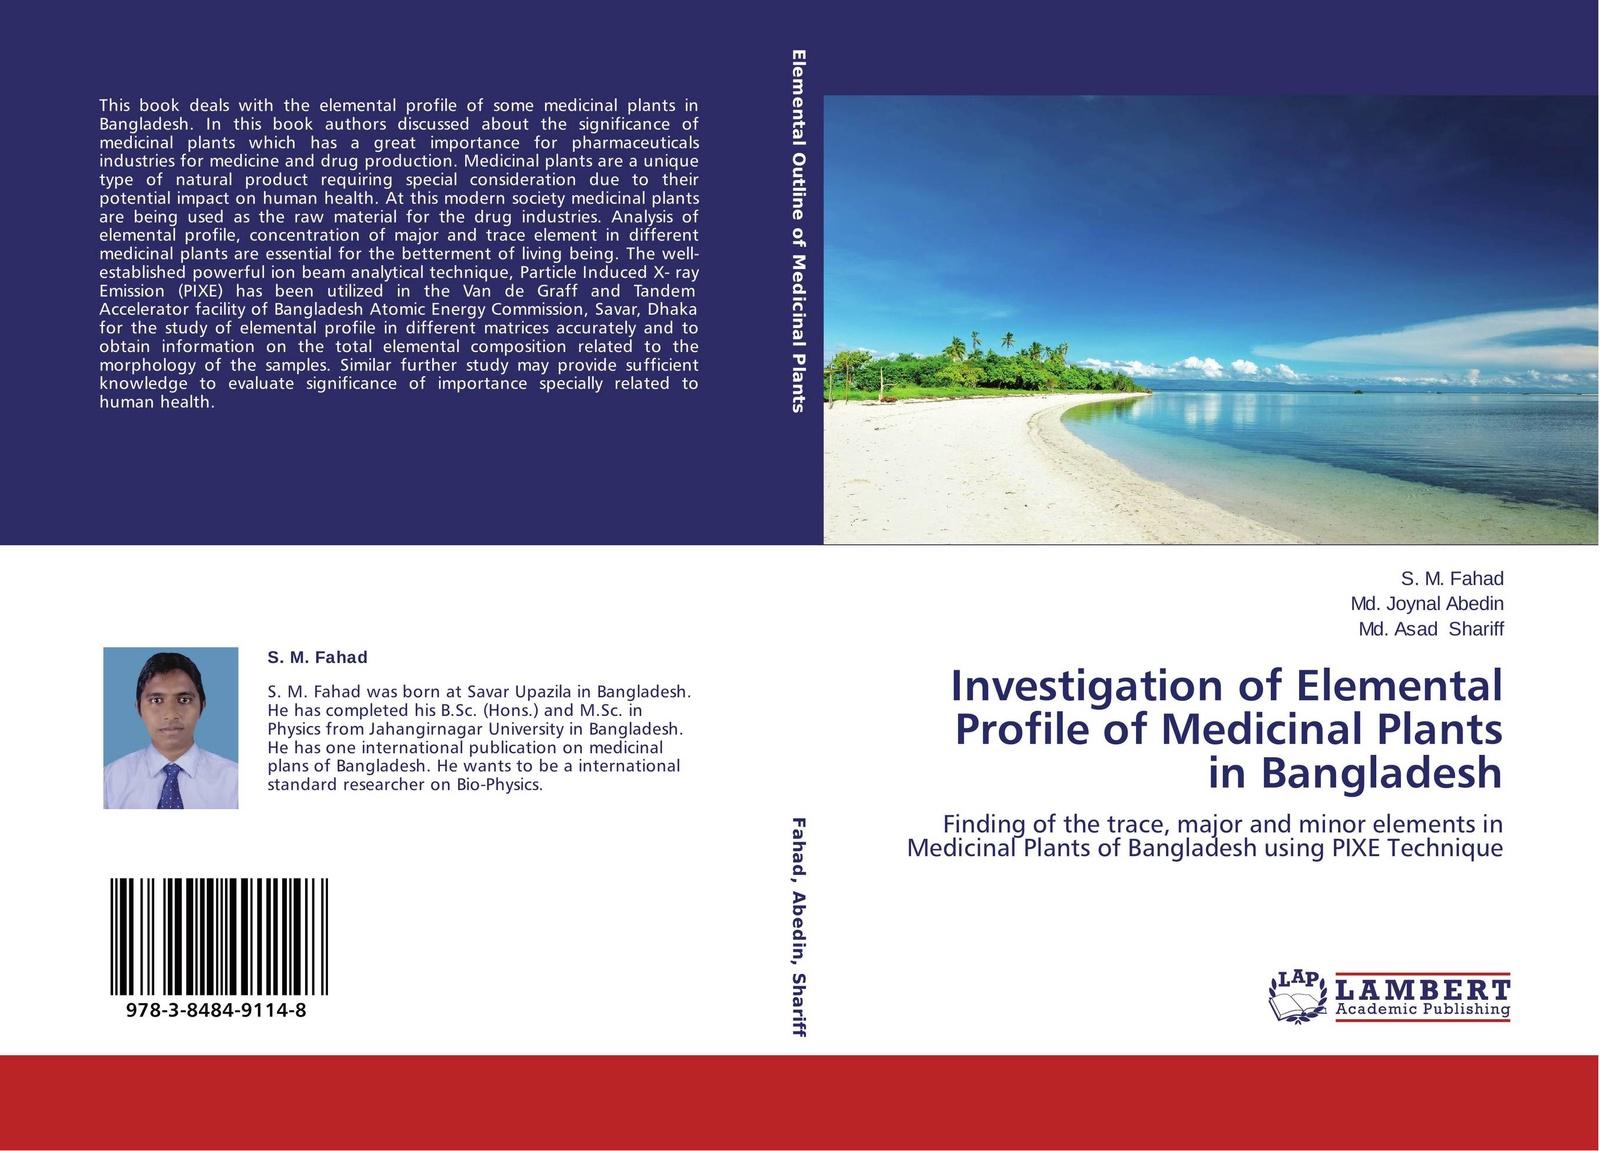 цена на S. M. Fahad,Md. Joynal Abedin and Md. Asad Shariff Investigation of Elemental Profile of Medicinal Plants in Bangladesh